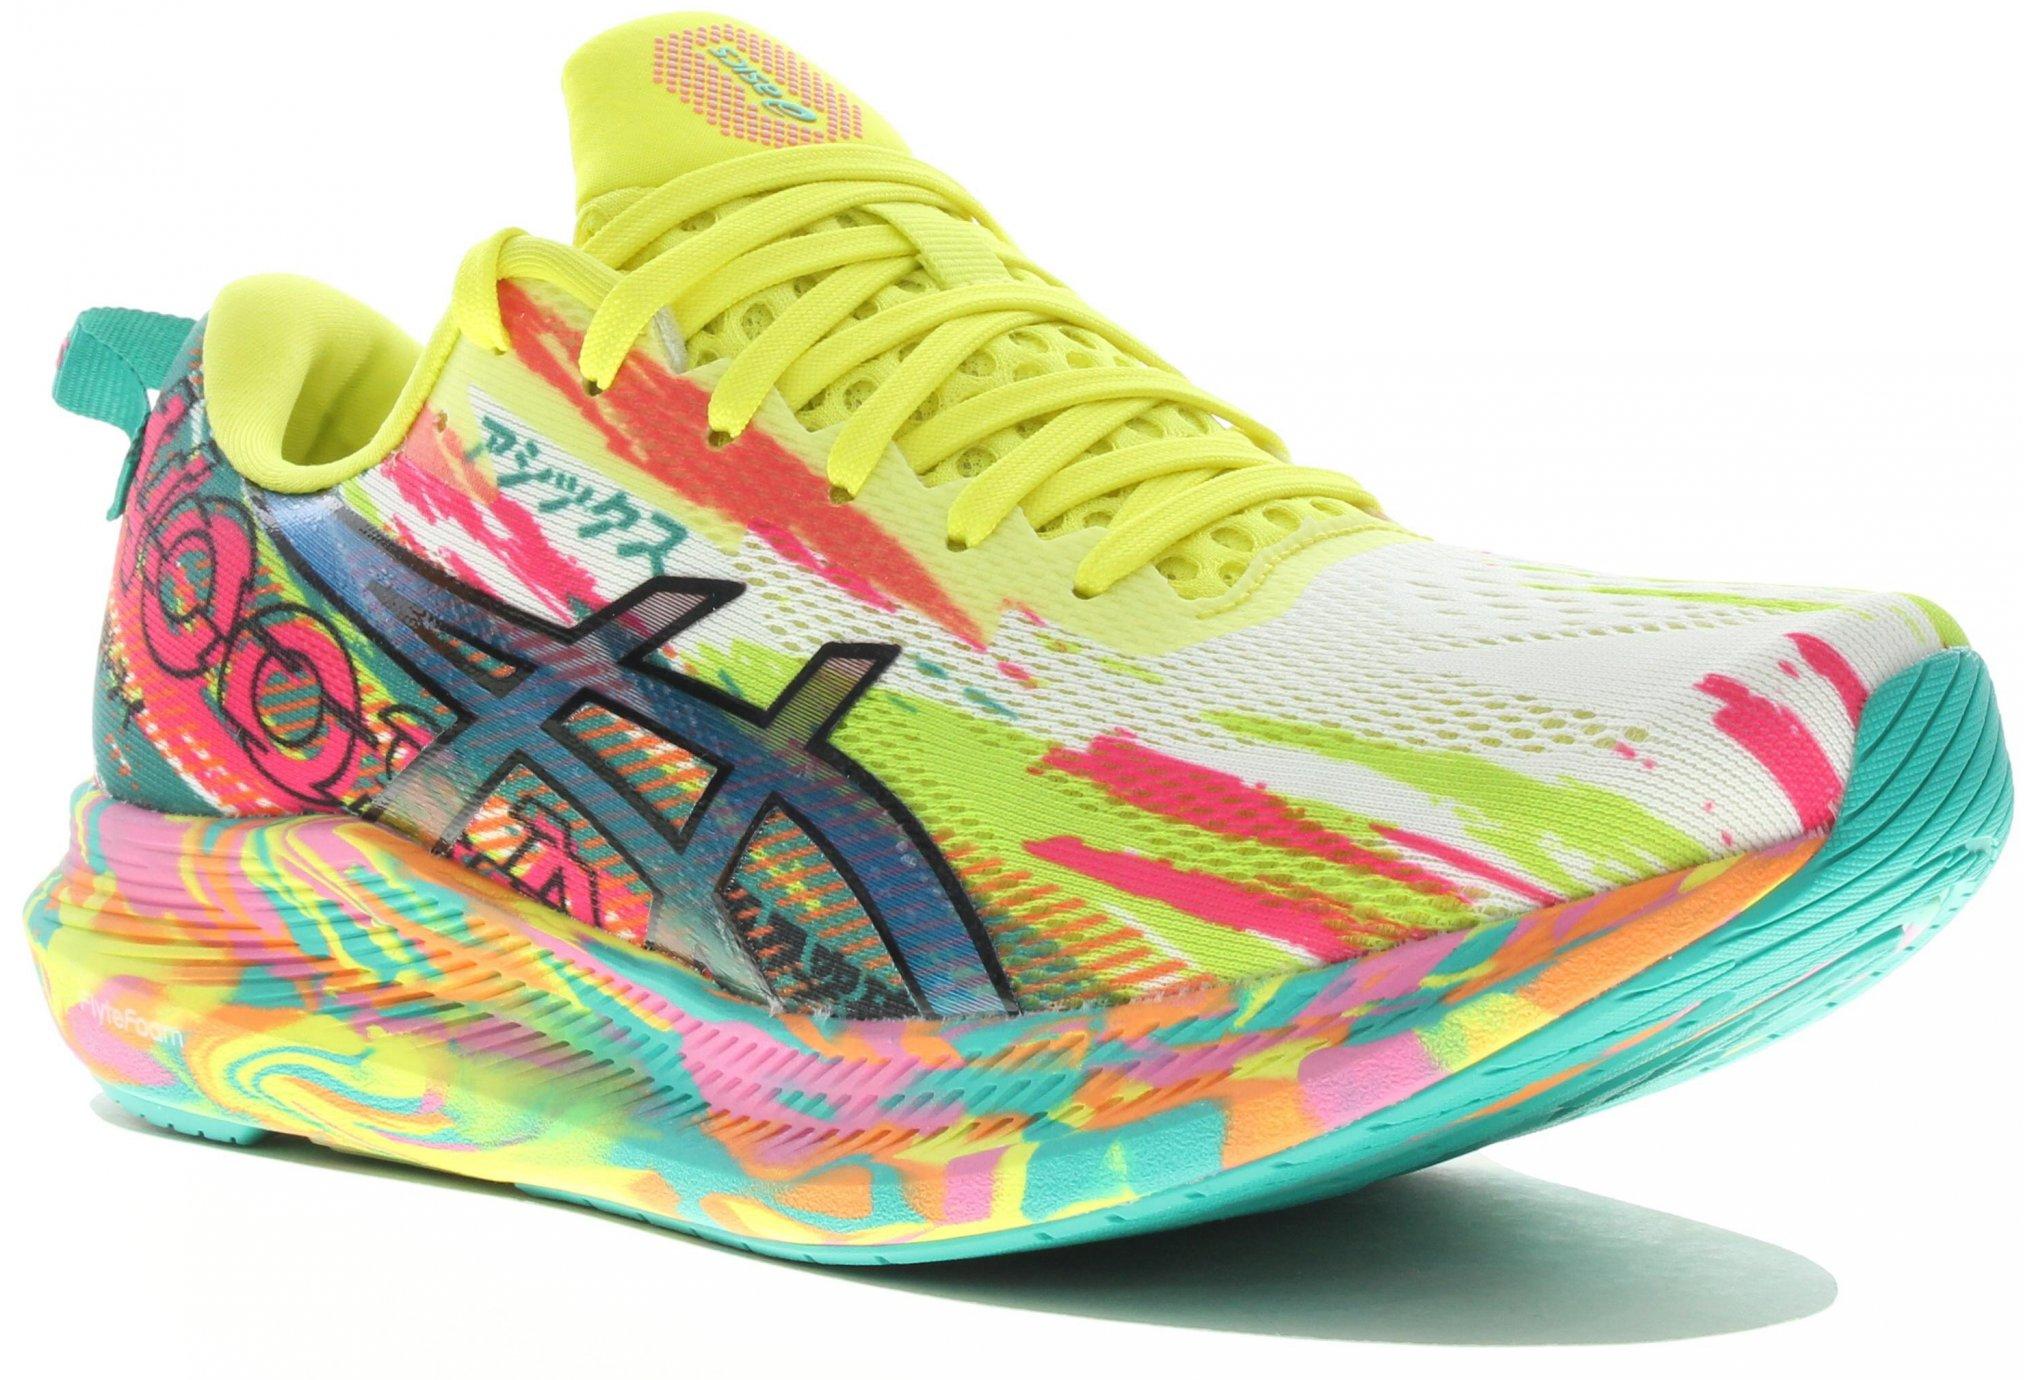 Asics Noosa Tri 13 W Chaussures running femme